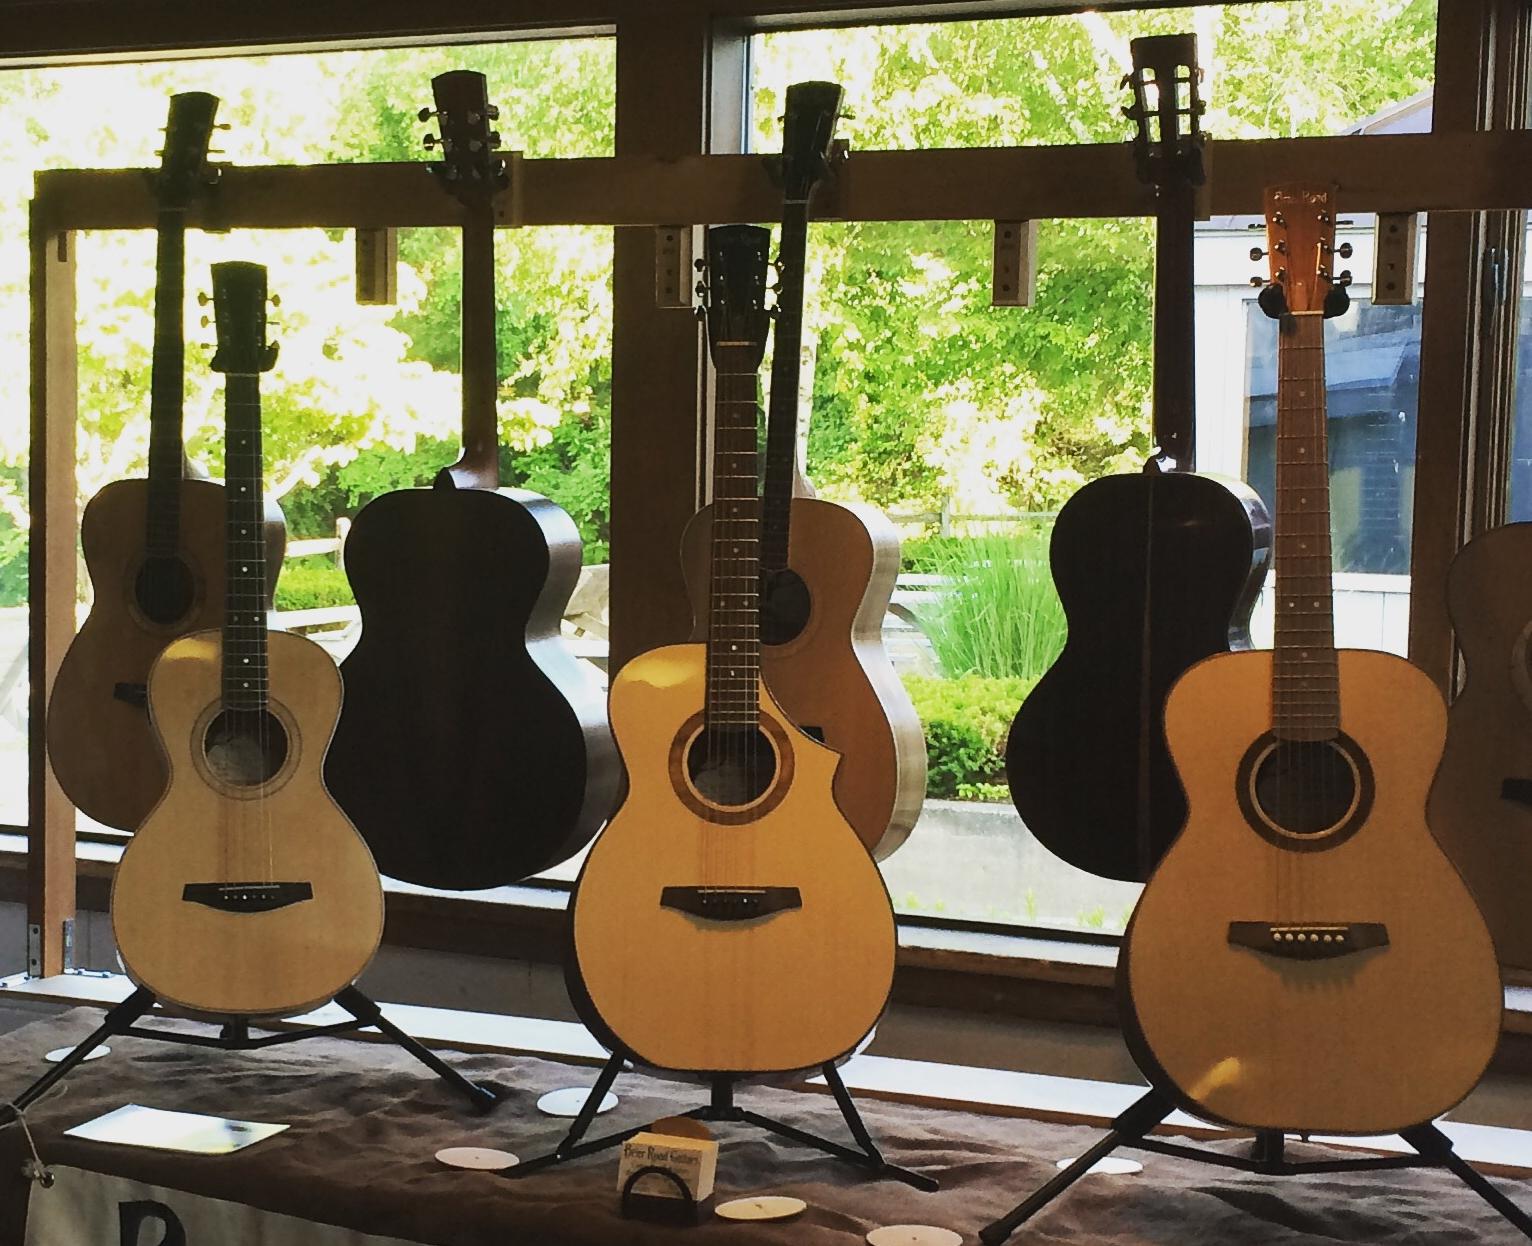 Berkshire Stringed Instruments